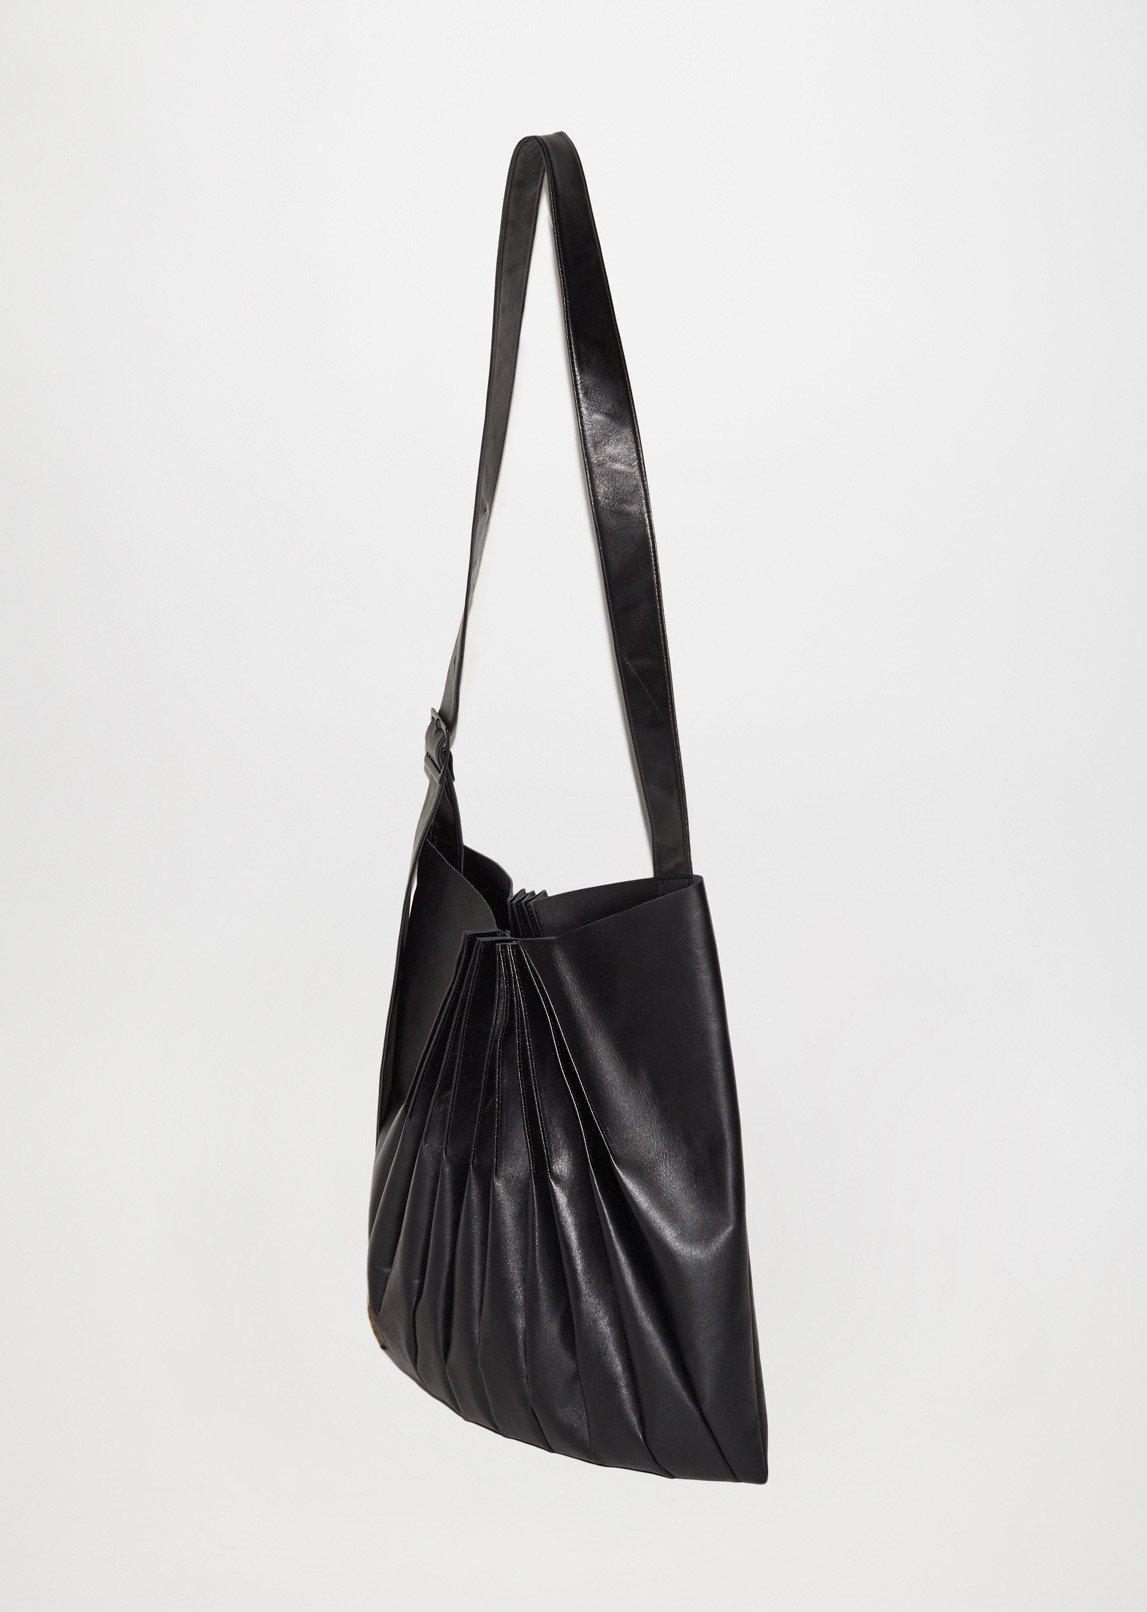 Lyst - Yohji Yamamoto Bellows Pleats Shoulder Bag in Black d6c9e73c12007